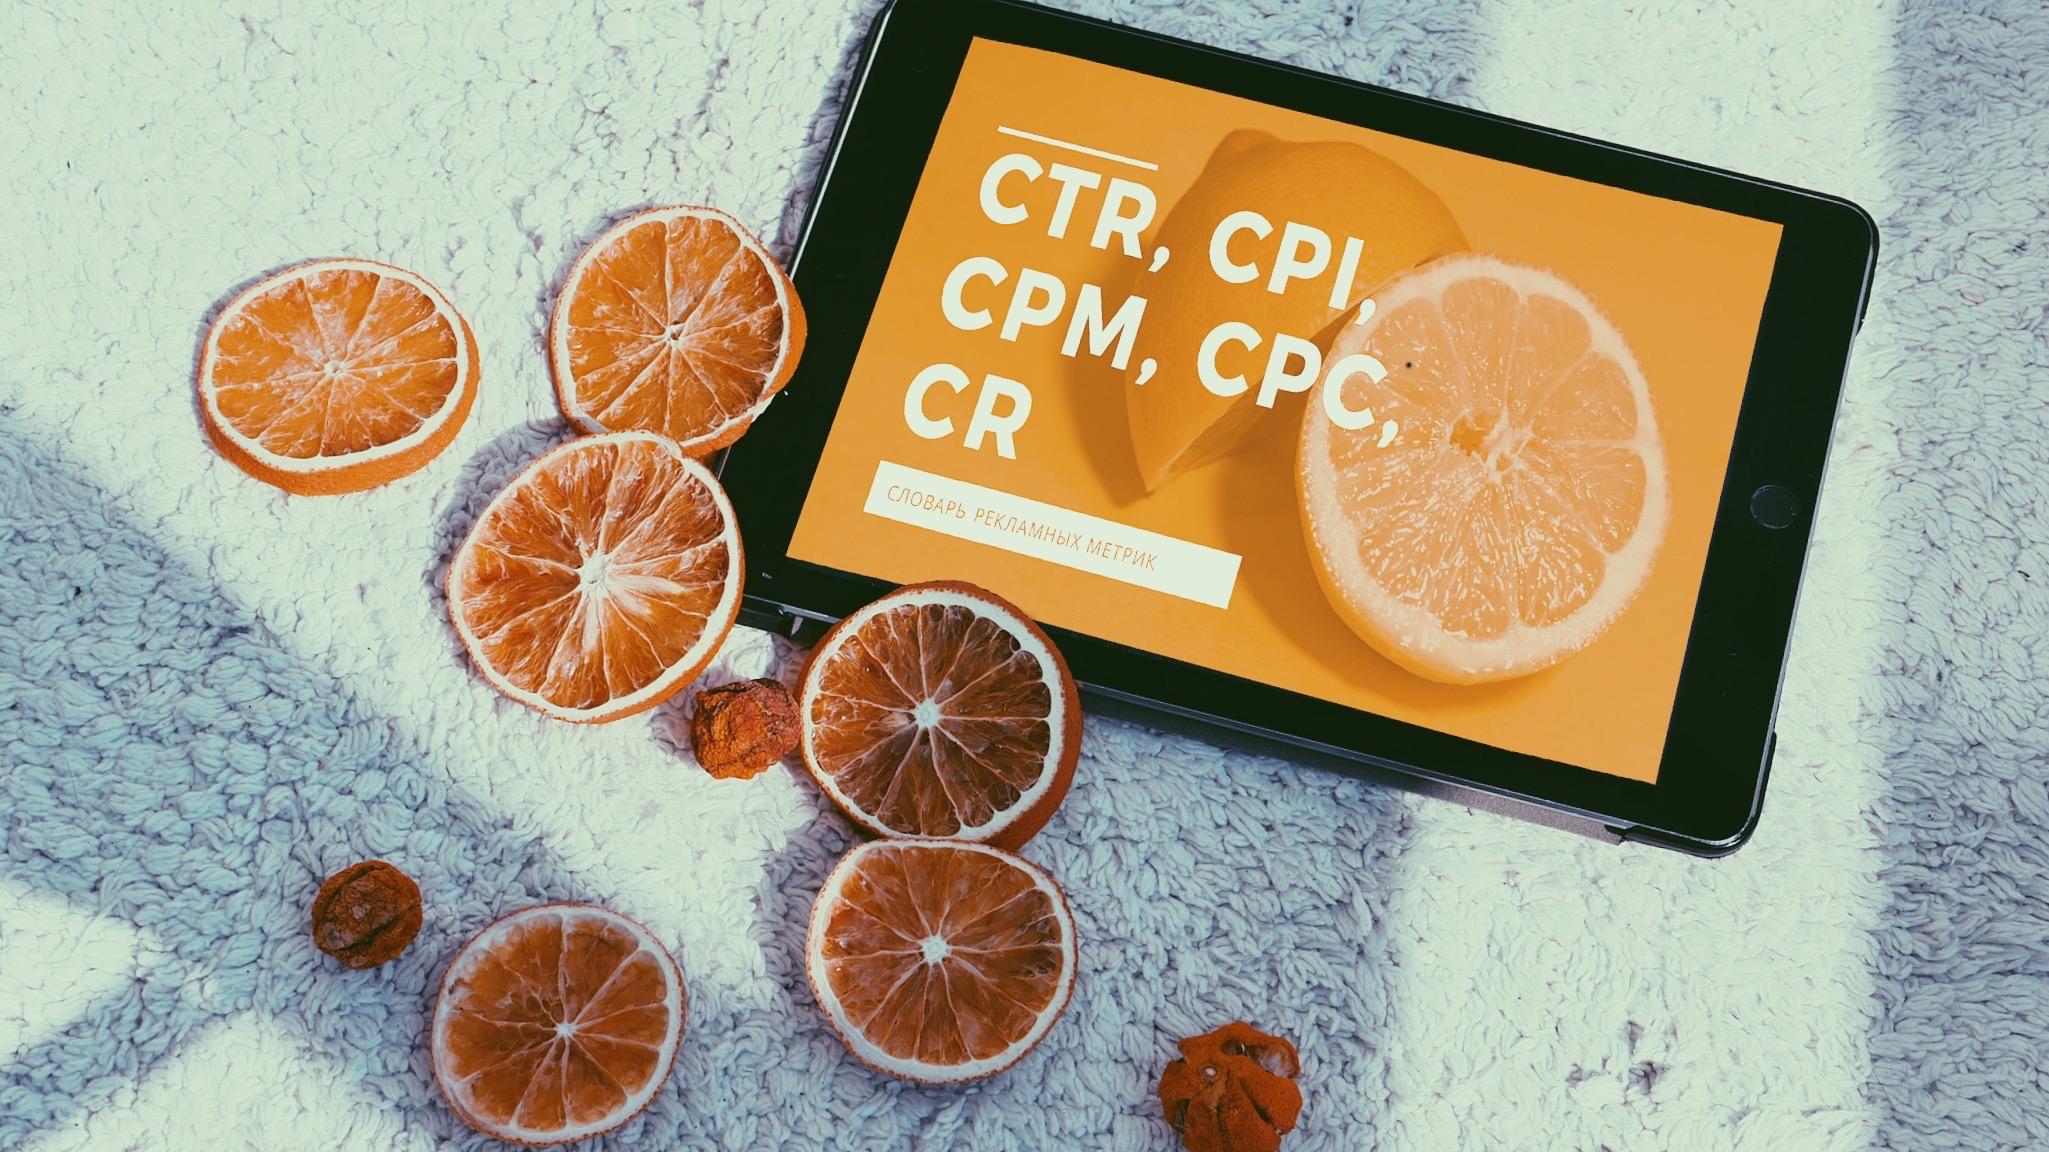 Словарь рекламных метрик. CTR, CPI, CPM, CPC, CR